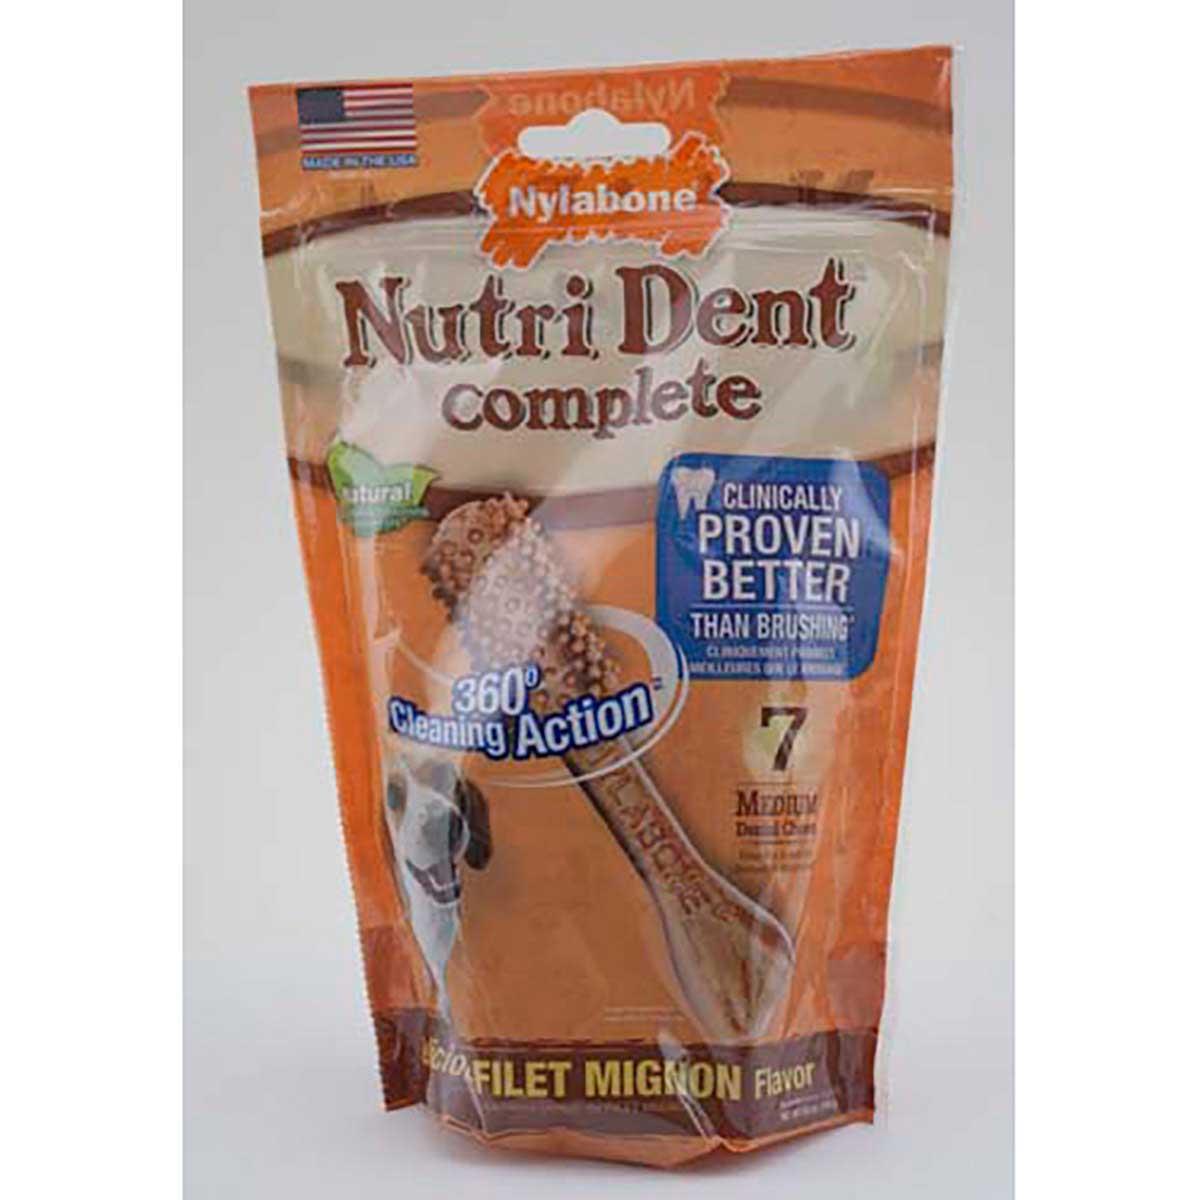 Nylabone Nutri Dent Filet Mignon Flavored Medium Dental Dog Chews - 7 Count